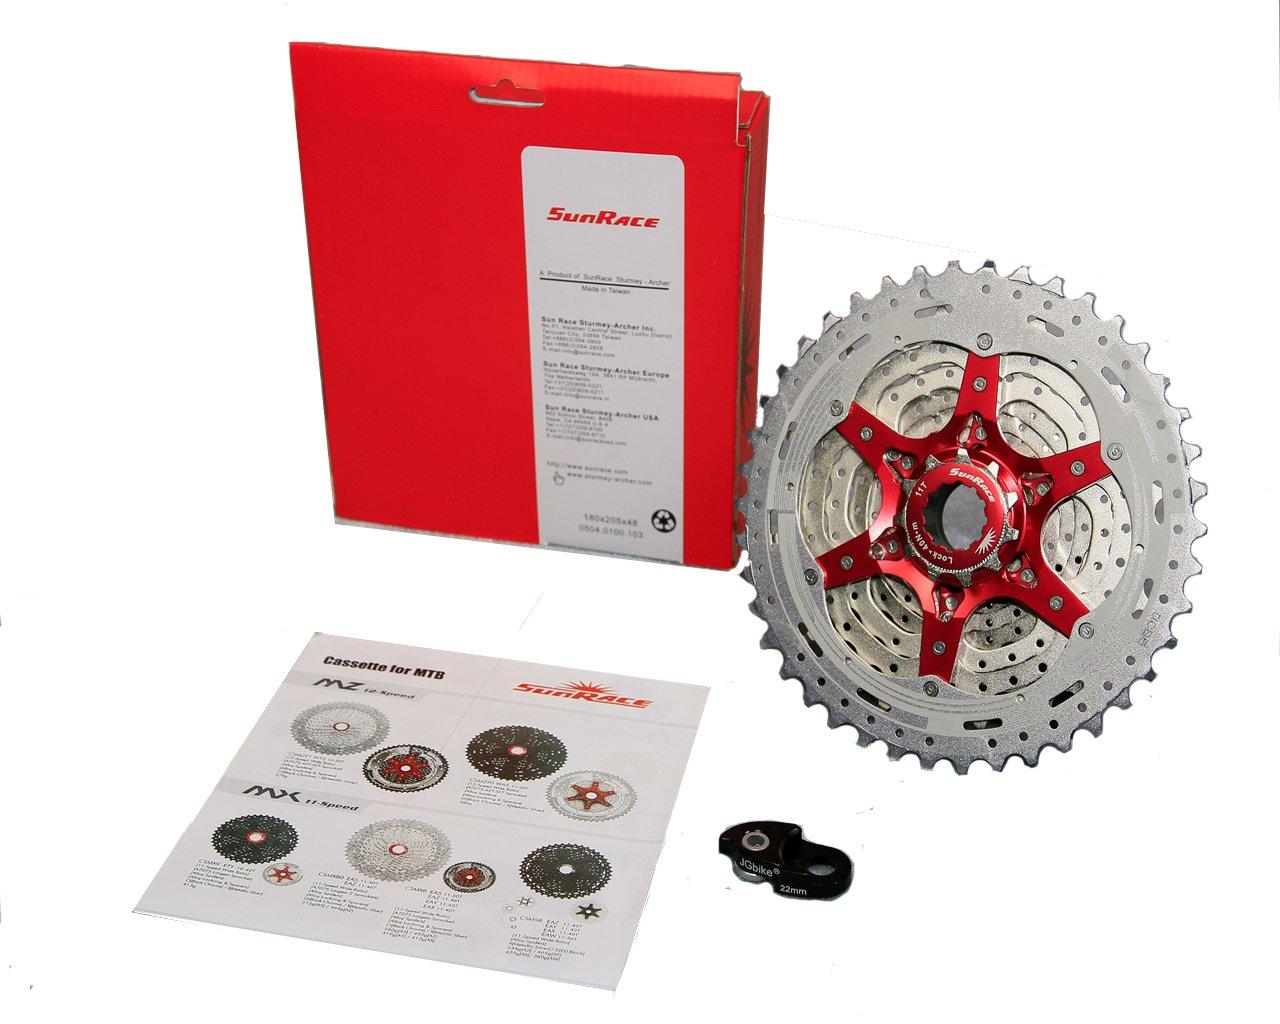 JGbike Sunrace 10 Speed Cassette 11-42T CSMX3 Silver Wide Ratio MTB Cassette for Mountain Bike Including Extender